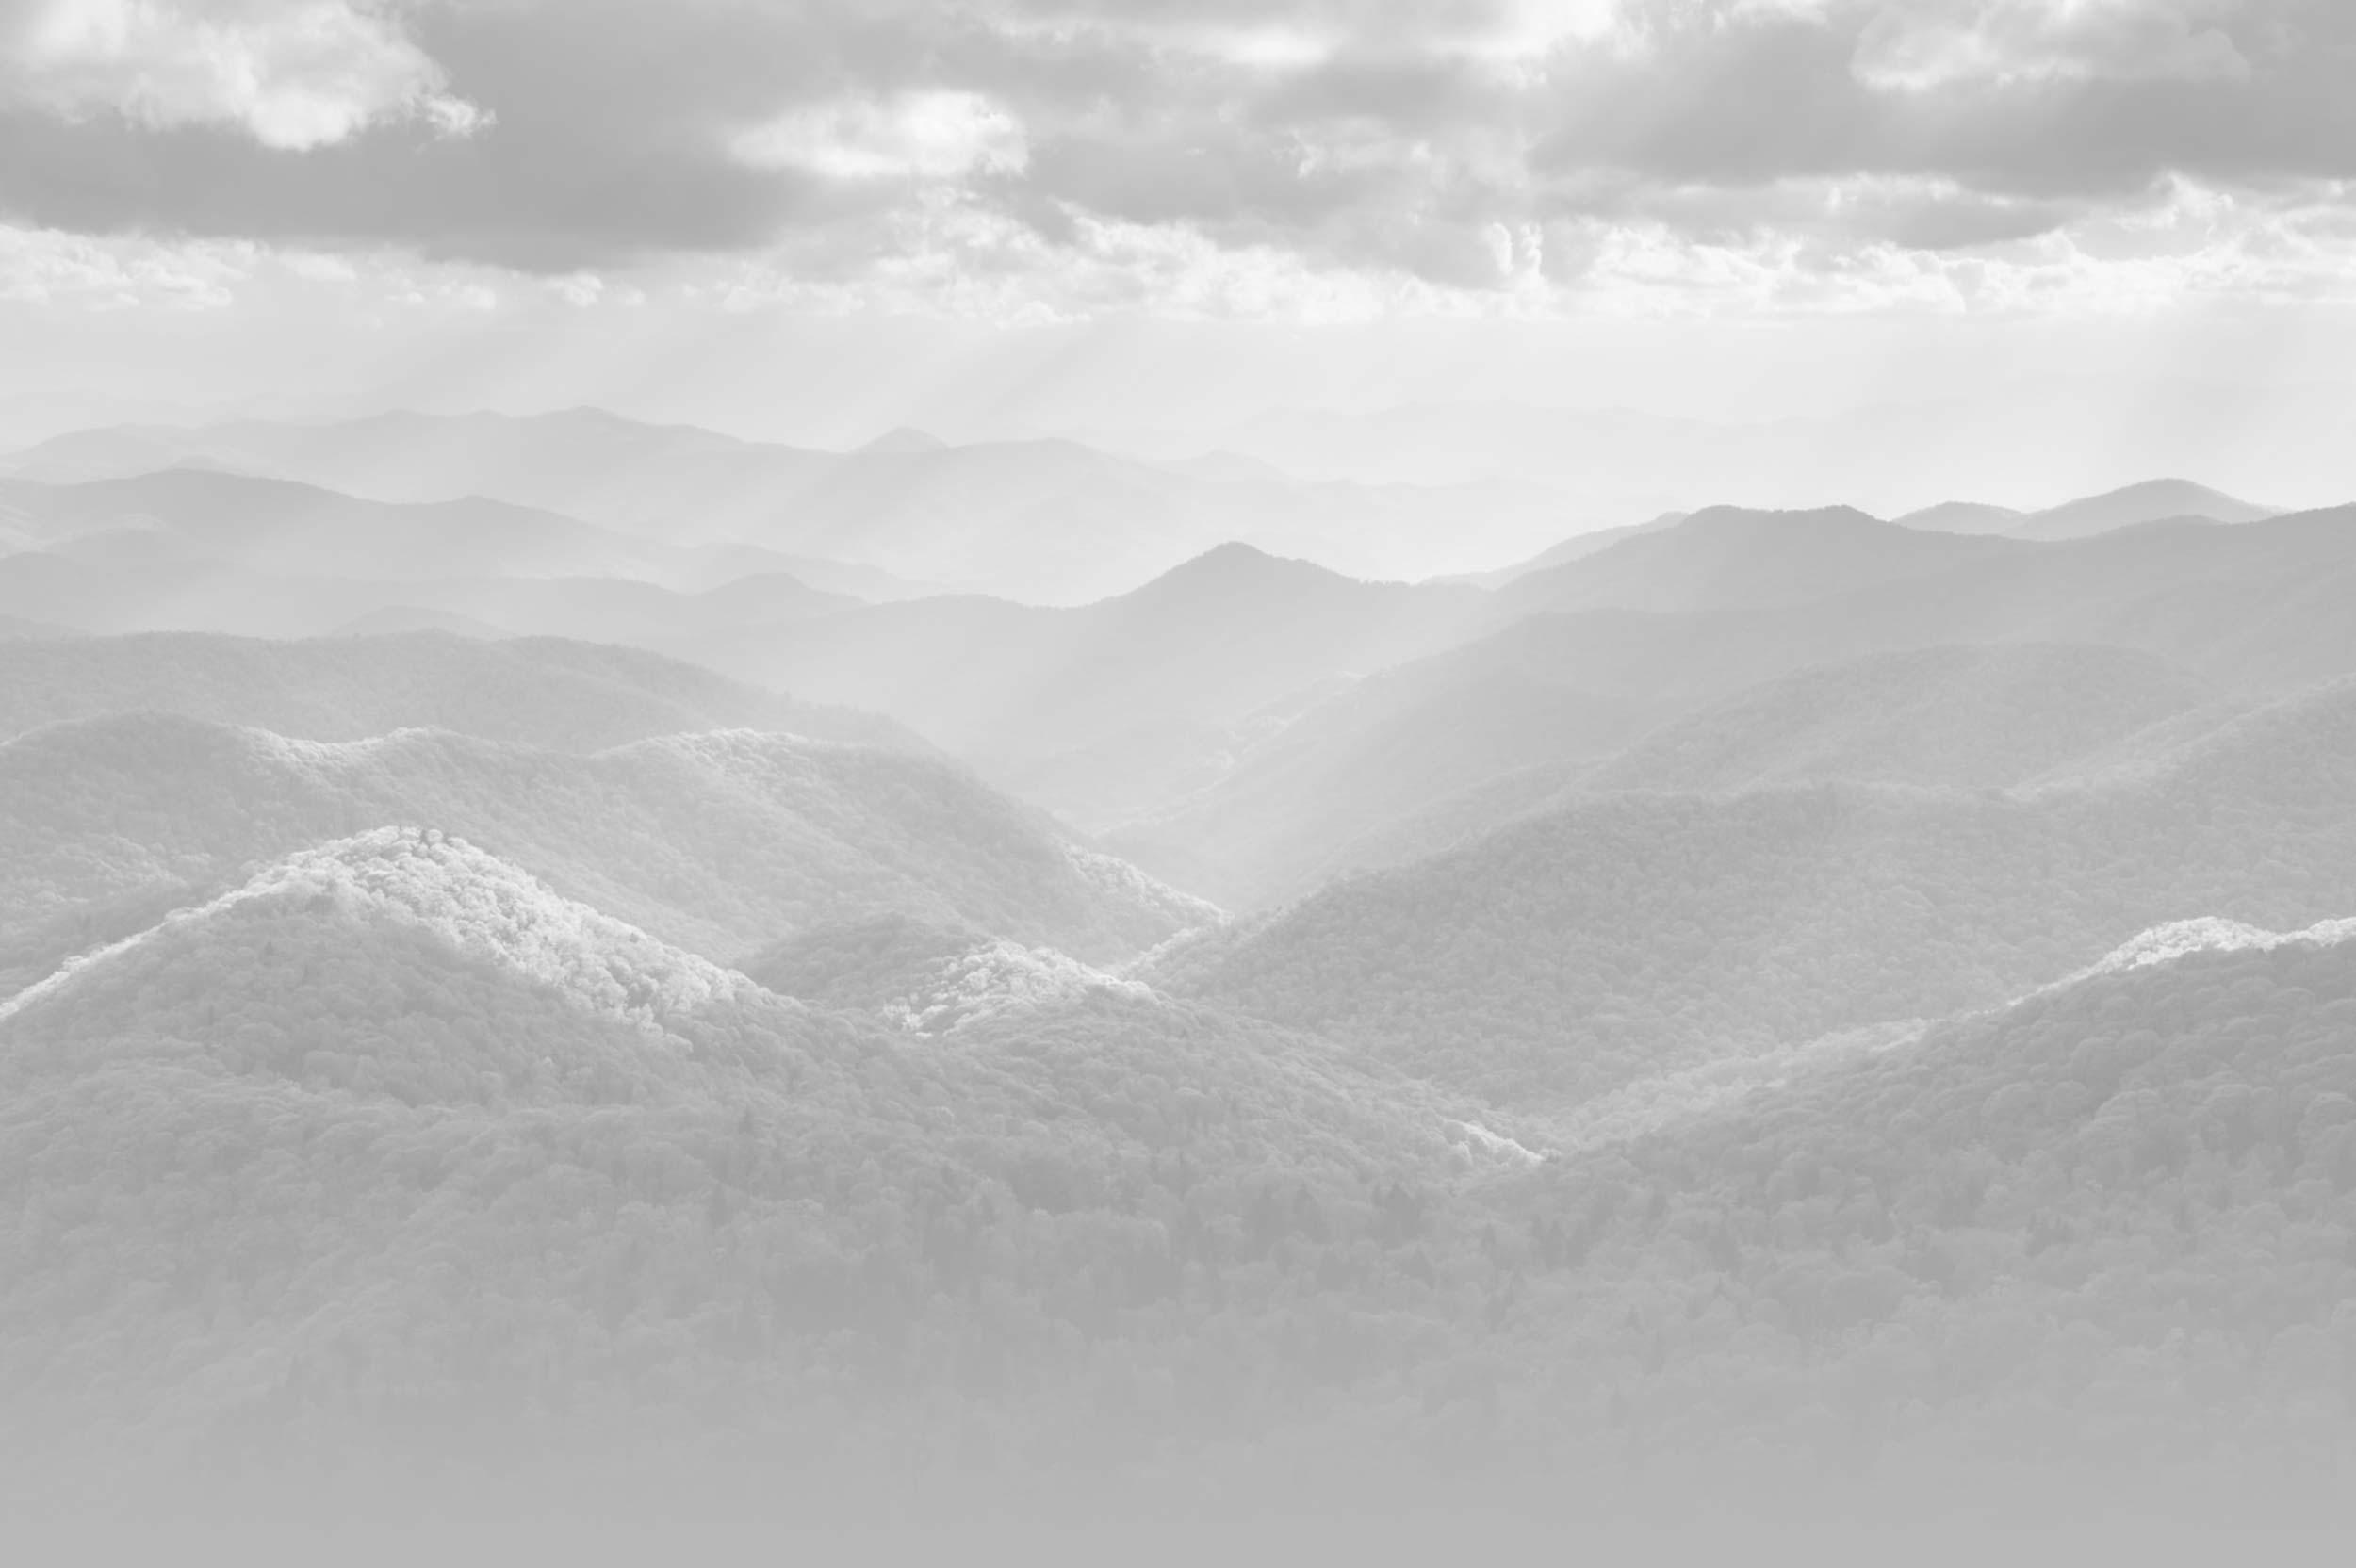 http://www.vantagep.com/wp-content/uploads/2014/08/mountains-gray-141540133.jpg